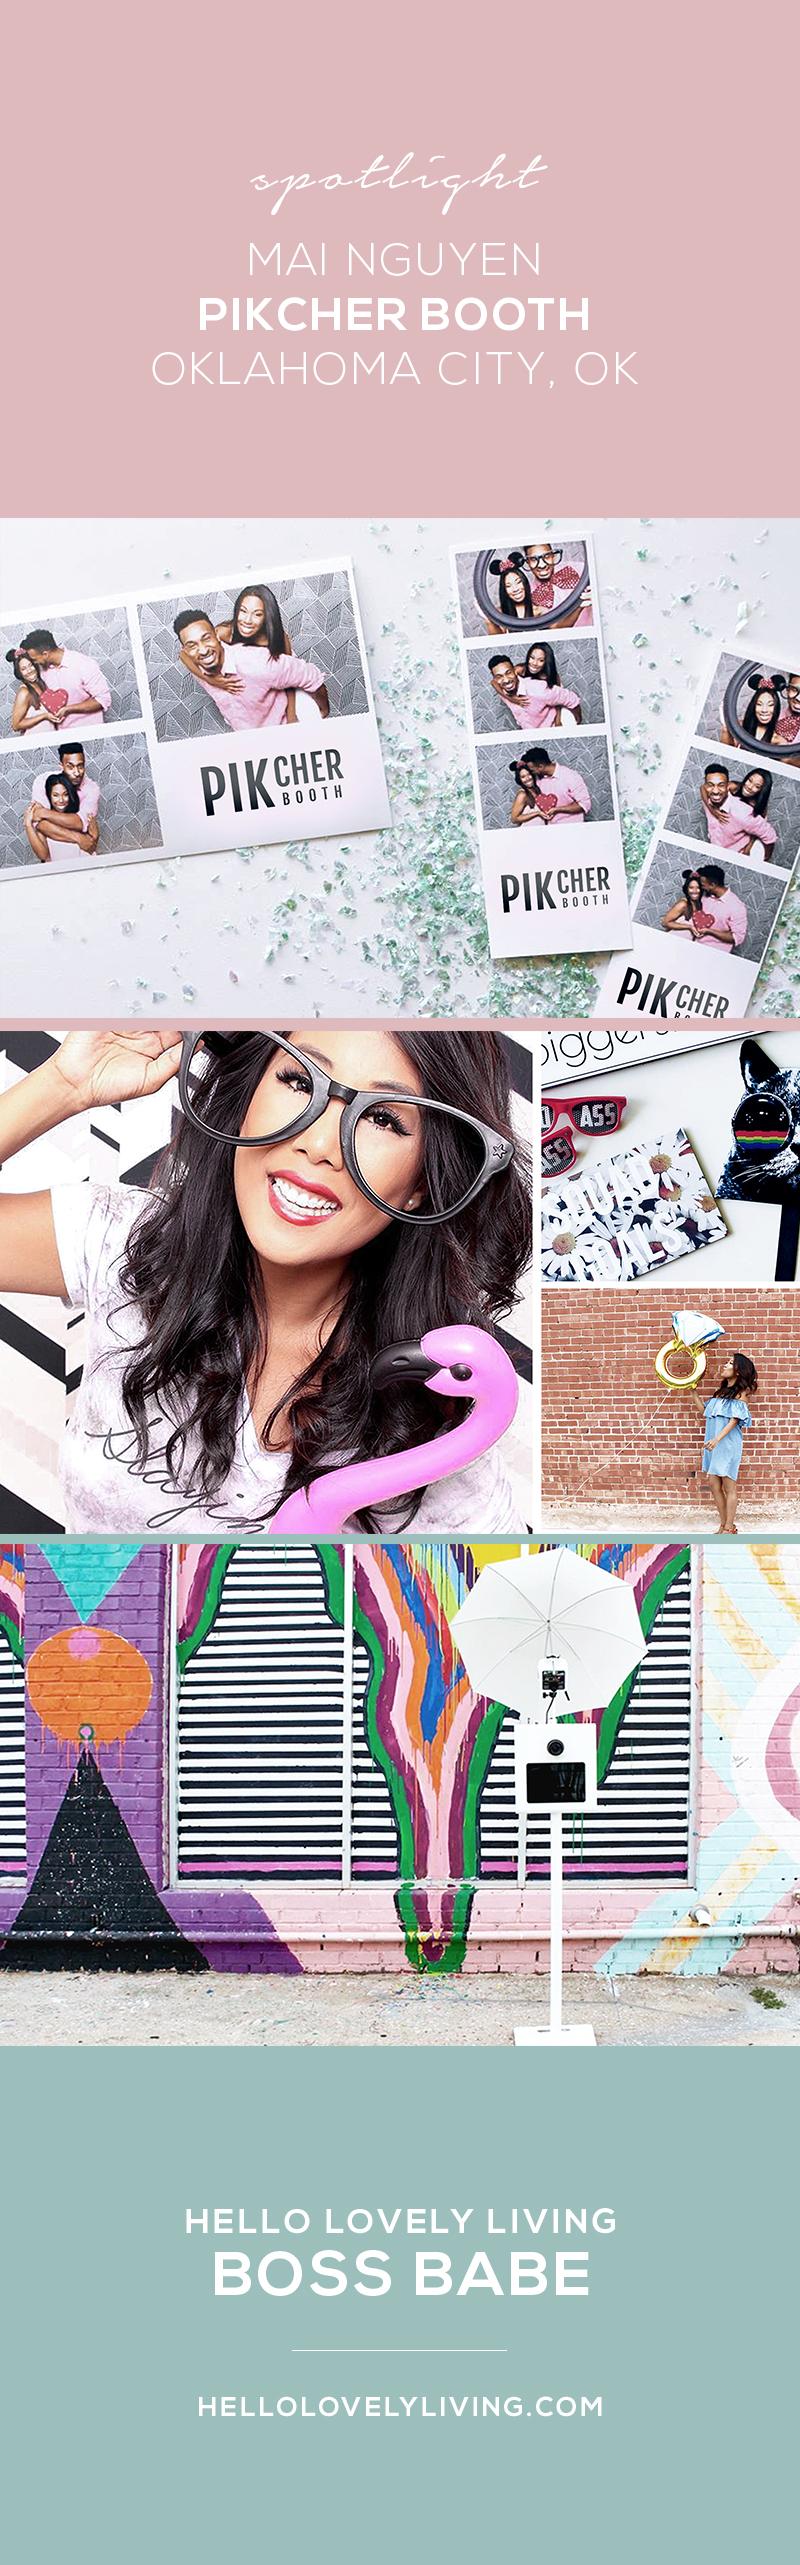 HelloLovelyLiving.com | Mai Nguyen pikCHER Booth Oklahoma City, OK